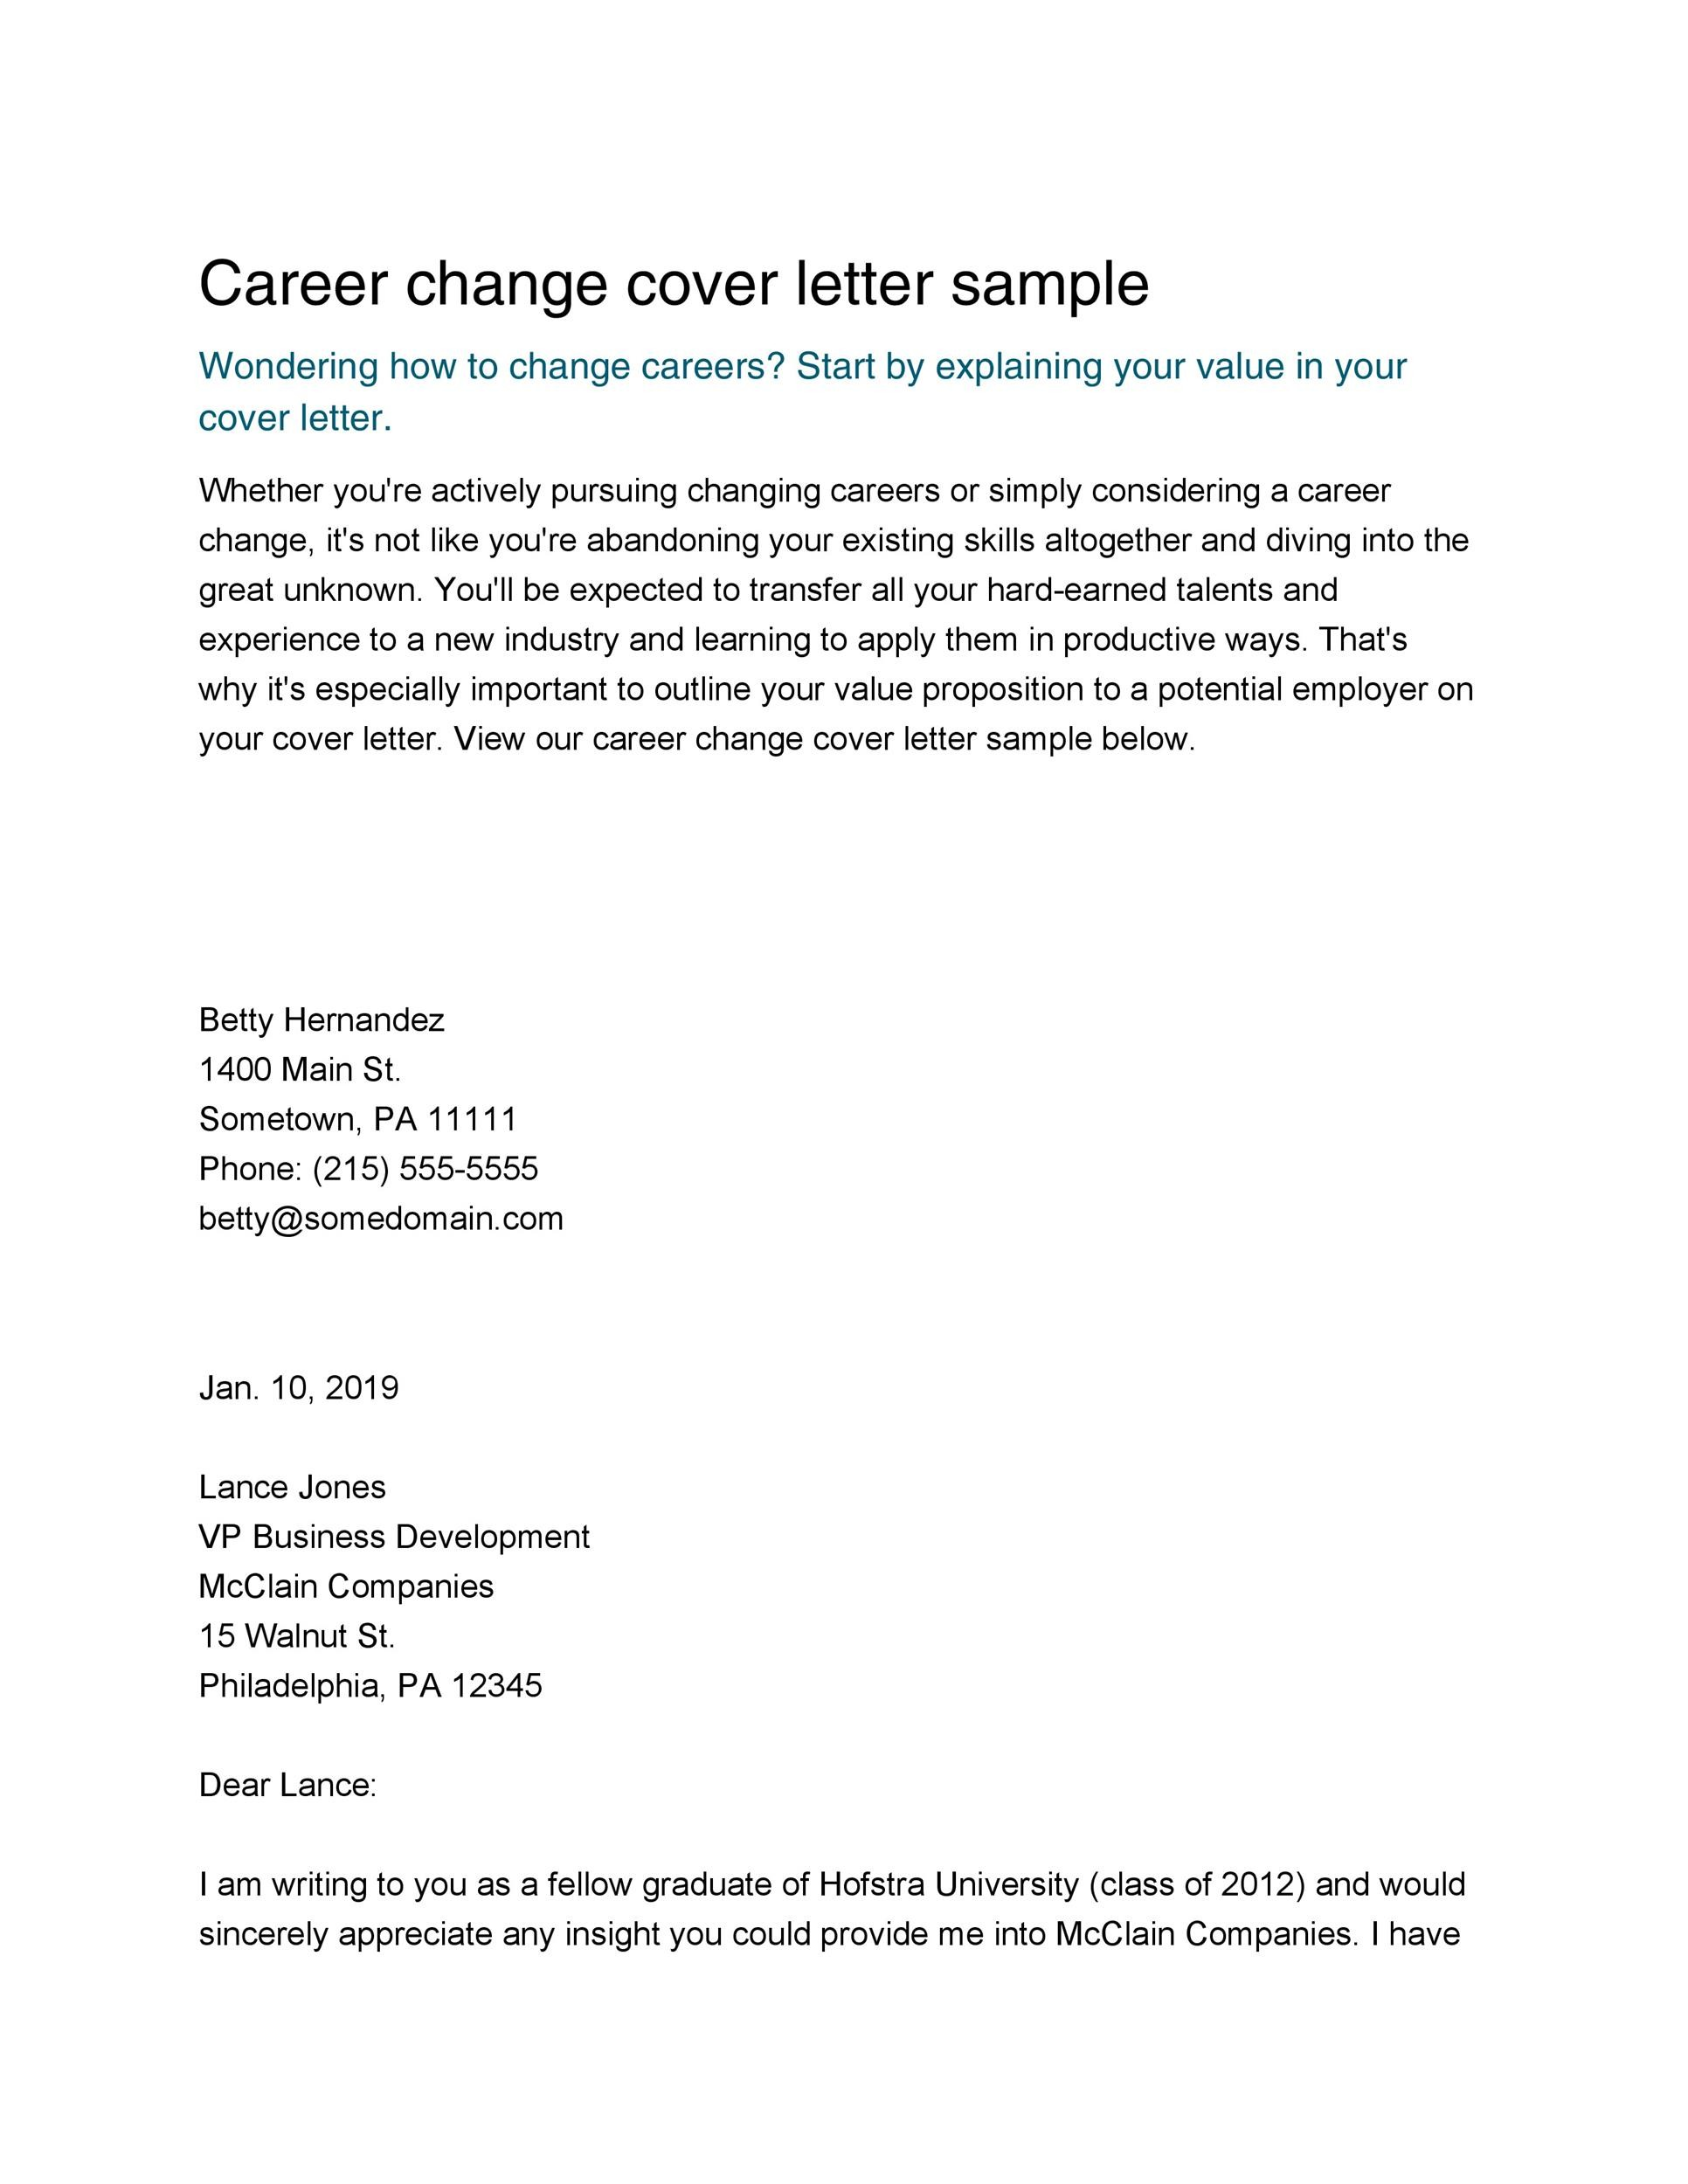 Free career change cover letter 36